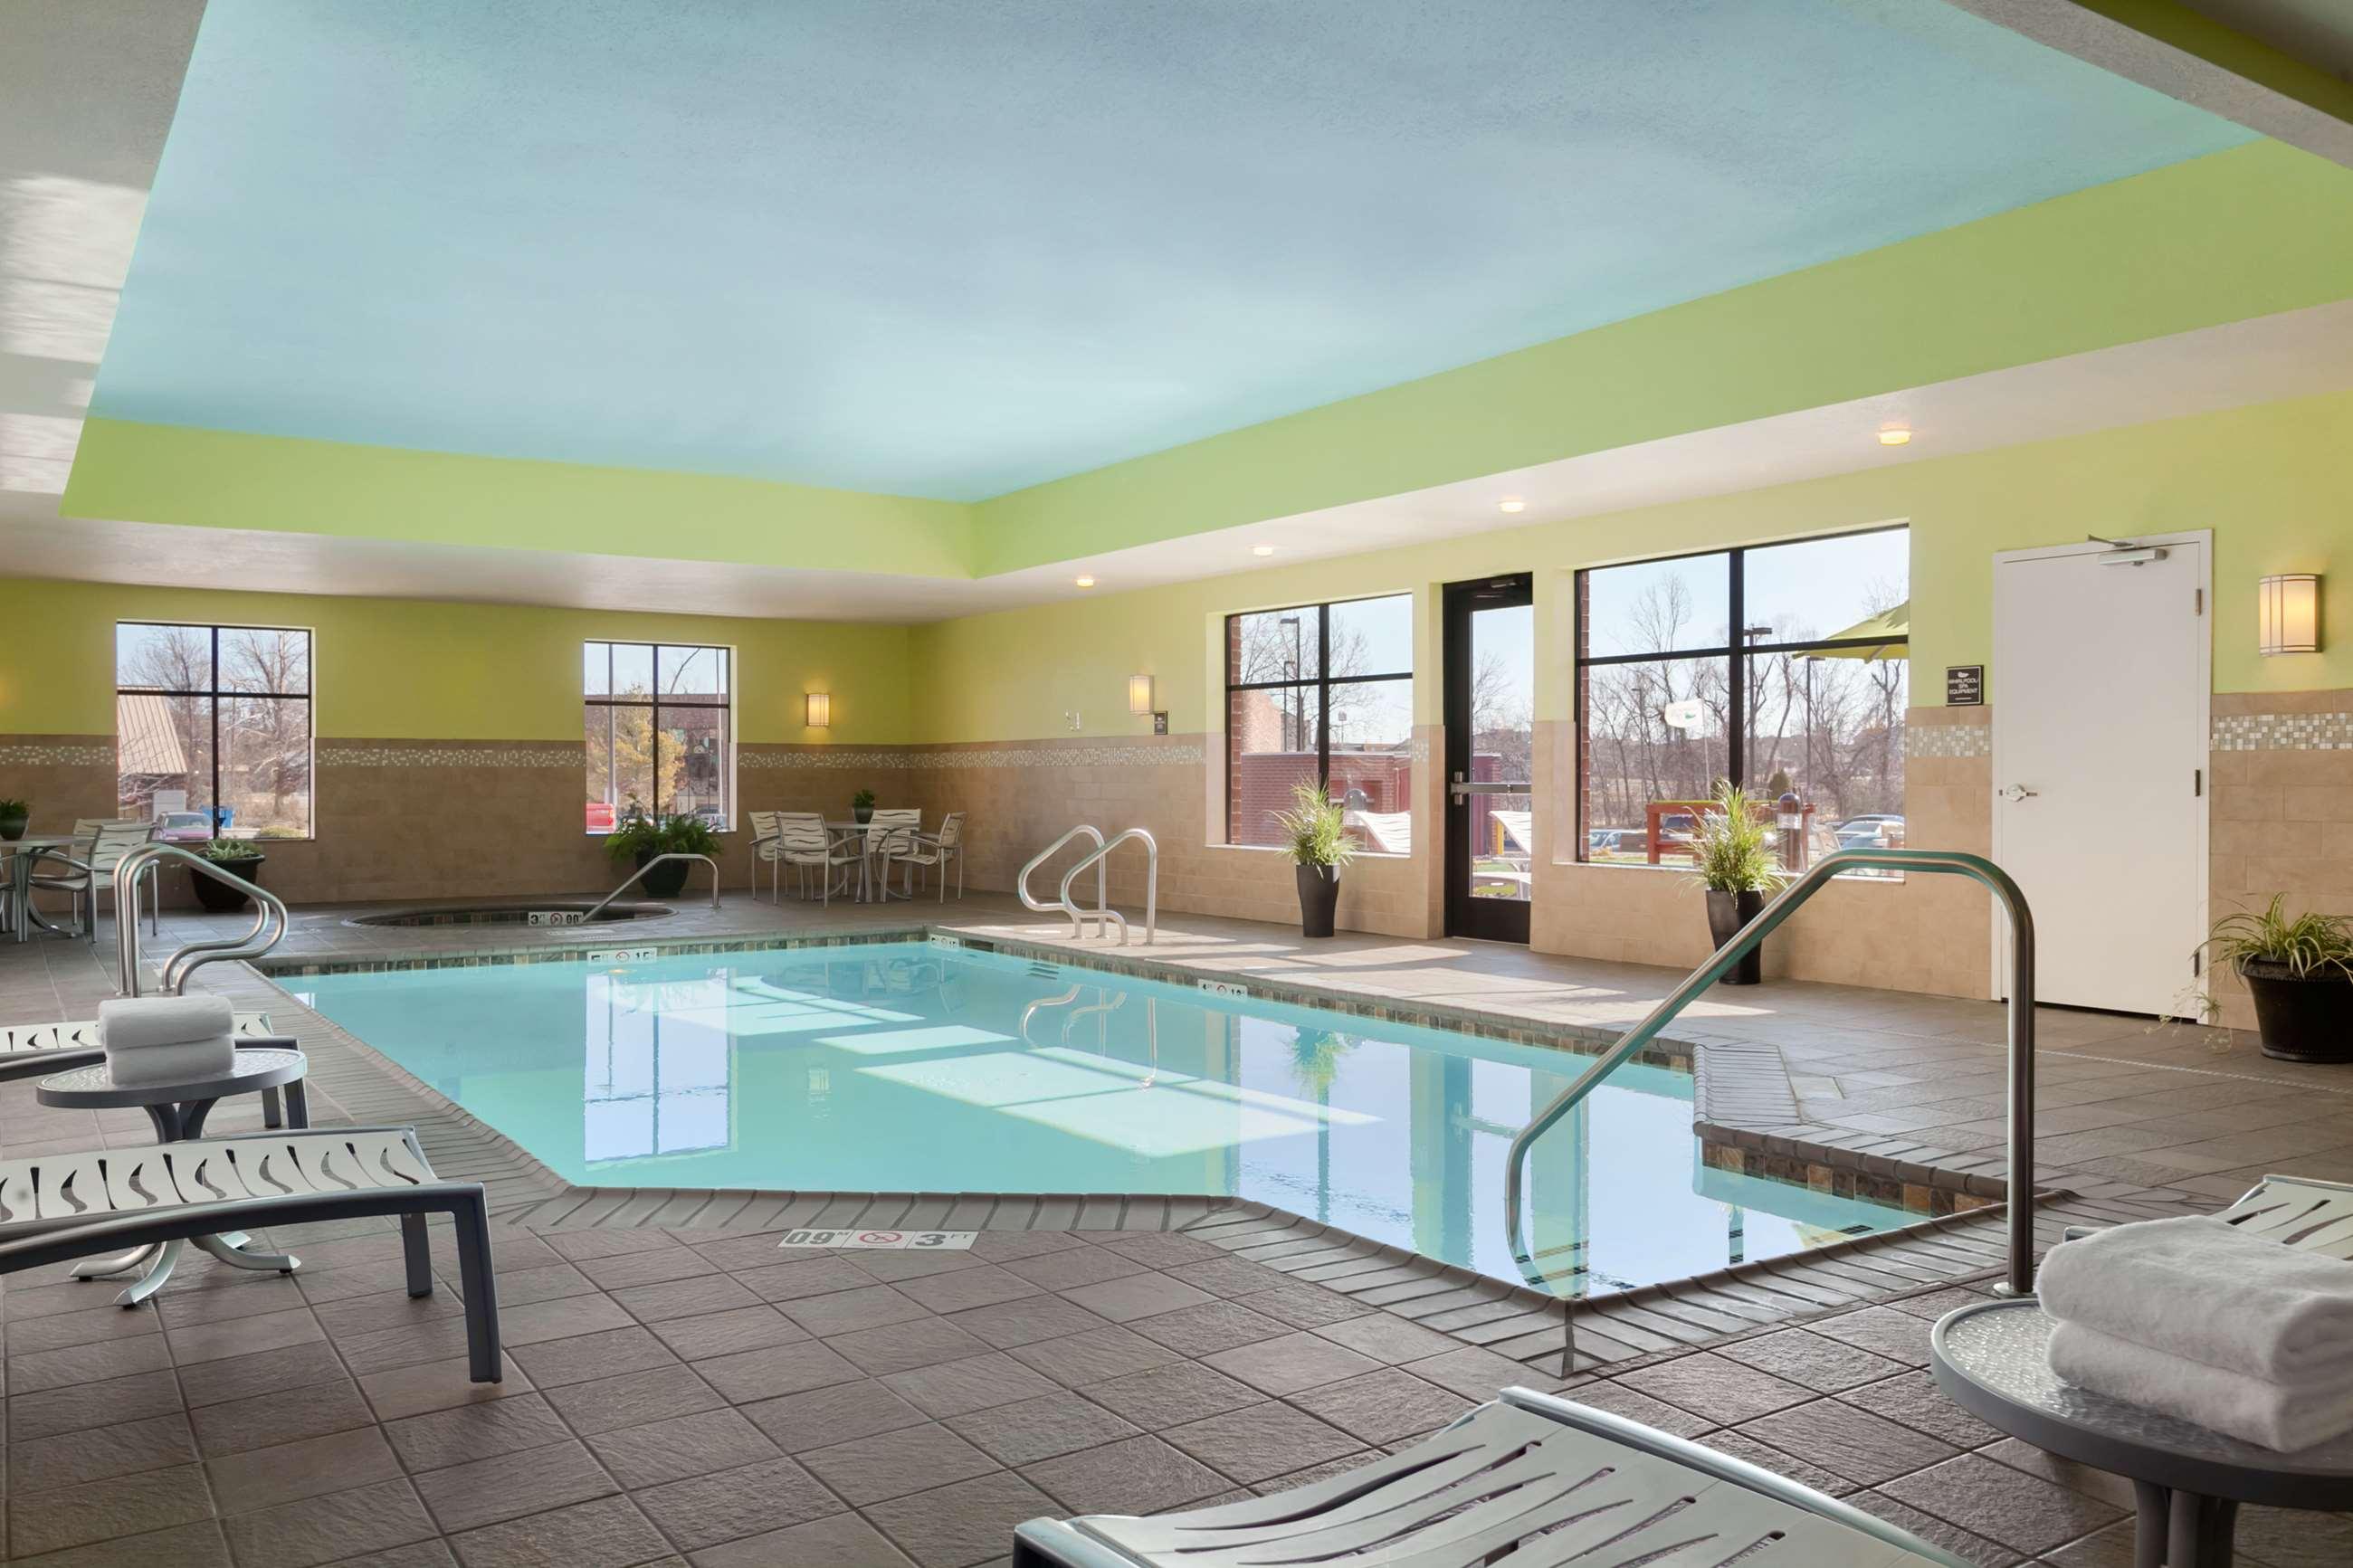 Homewood Suites by Hilton Joplin, MO image 3